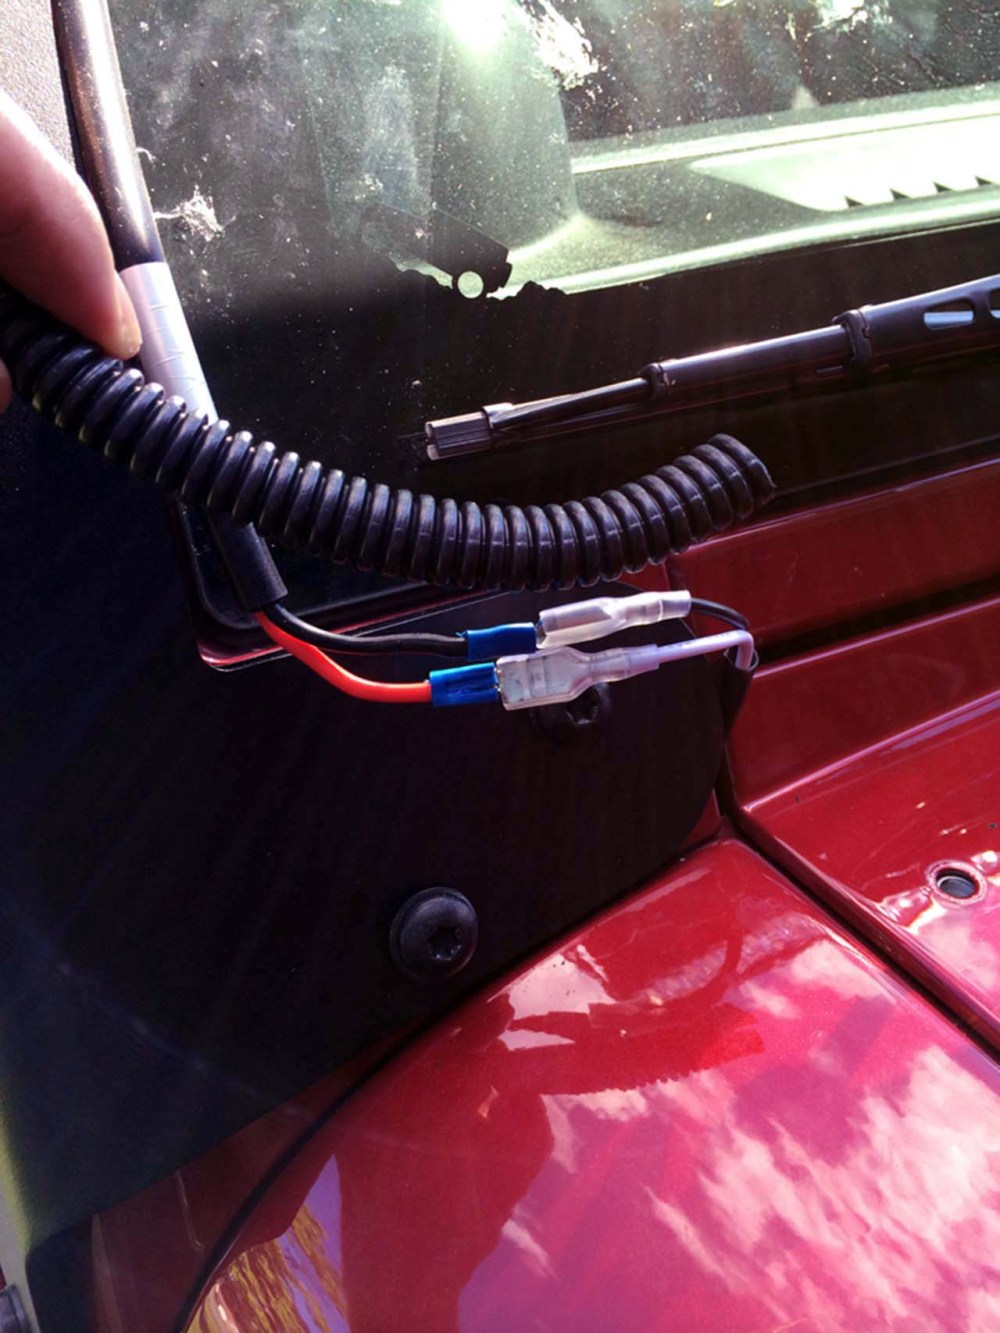 medium resolution of raxiom wrangler jk light bar installation wiring the harness wiring harness for jeep jk led light bar on wiring a light bar on jeep